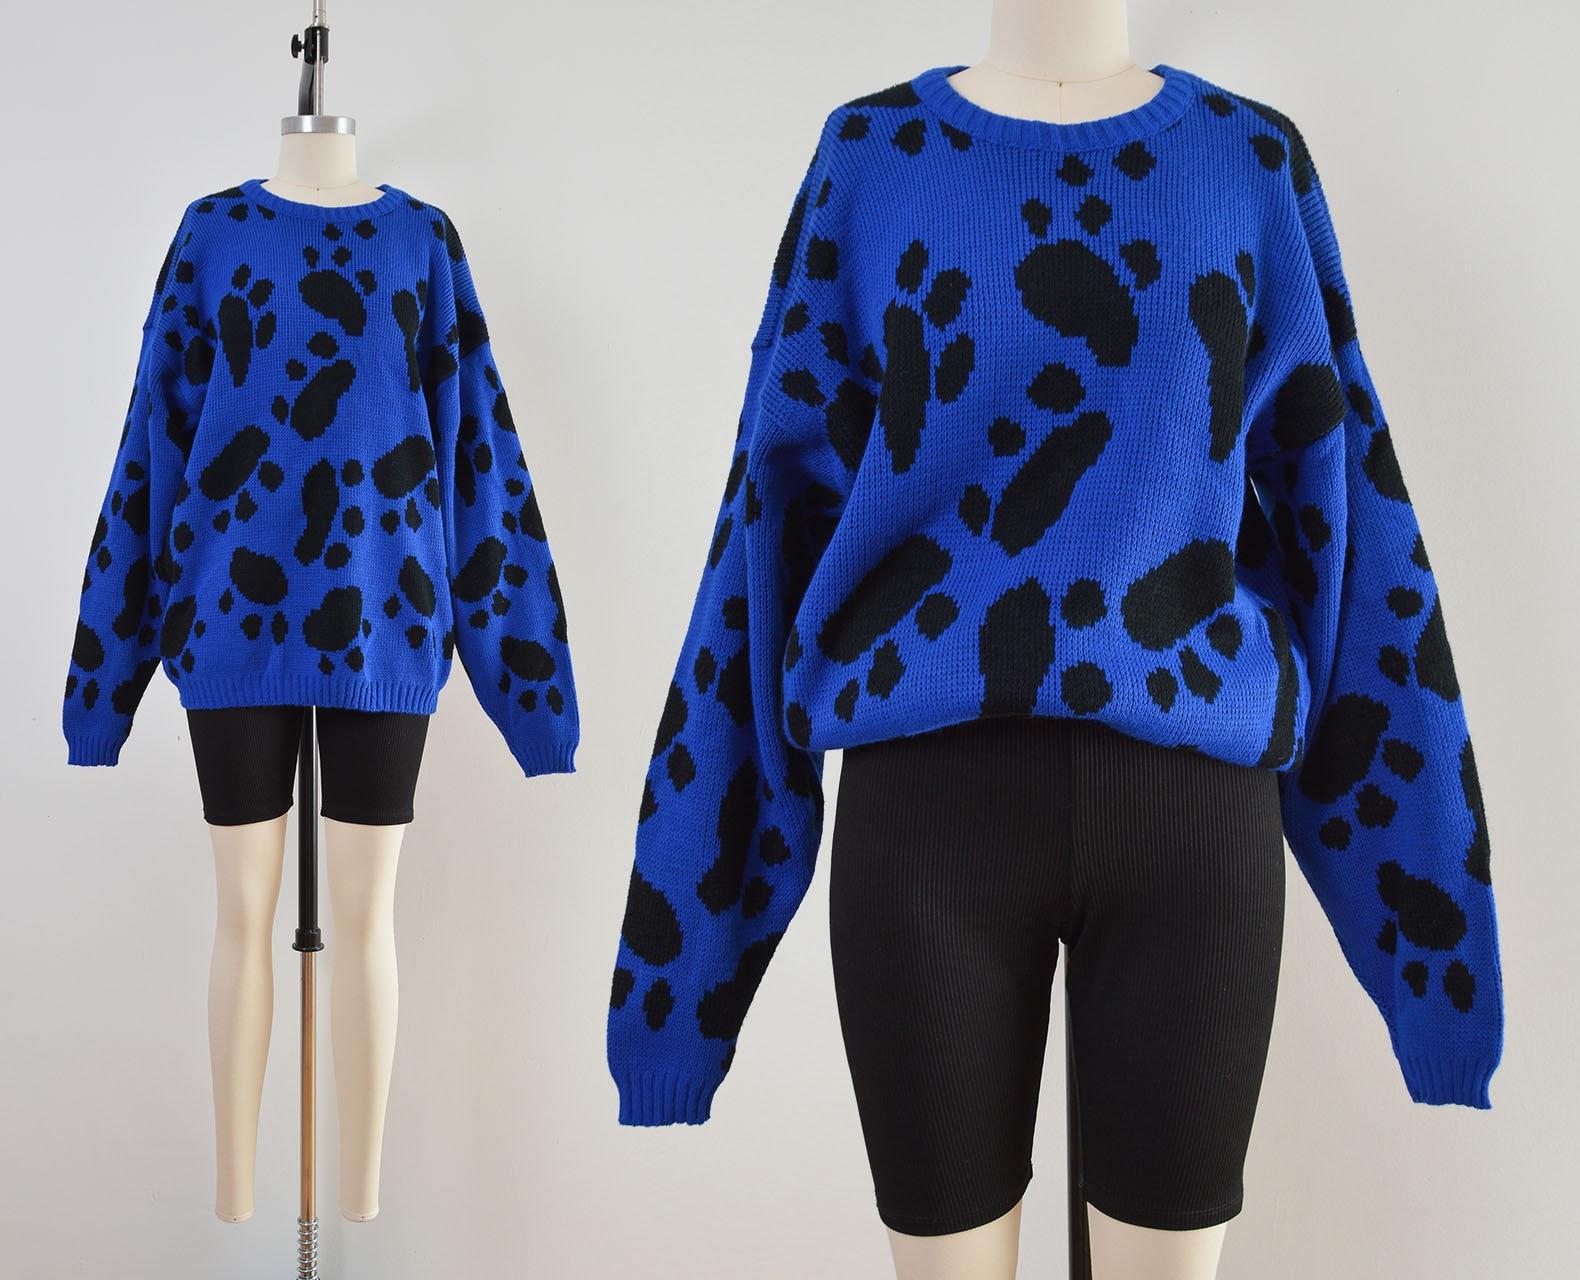 80s Sweatshirts, Sweaters, Vests | Women Vintage Paw Print Sweater  Blue  Black Dog Lover Size M L $62.00 AT vintagedancer.com